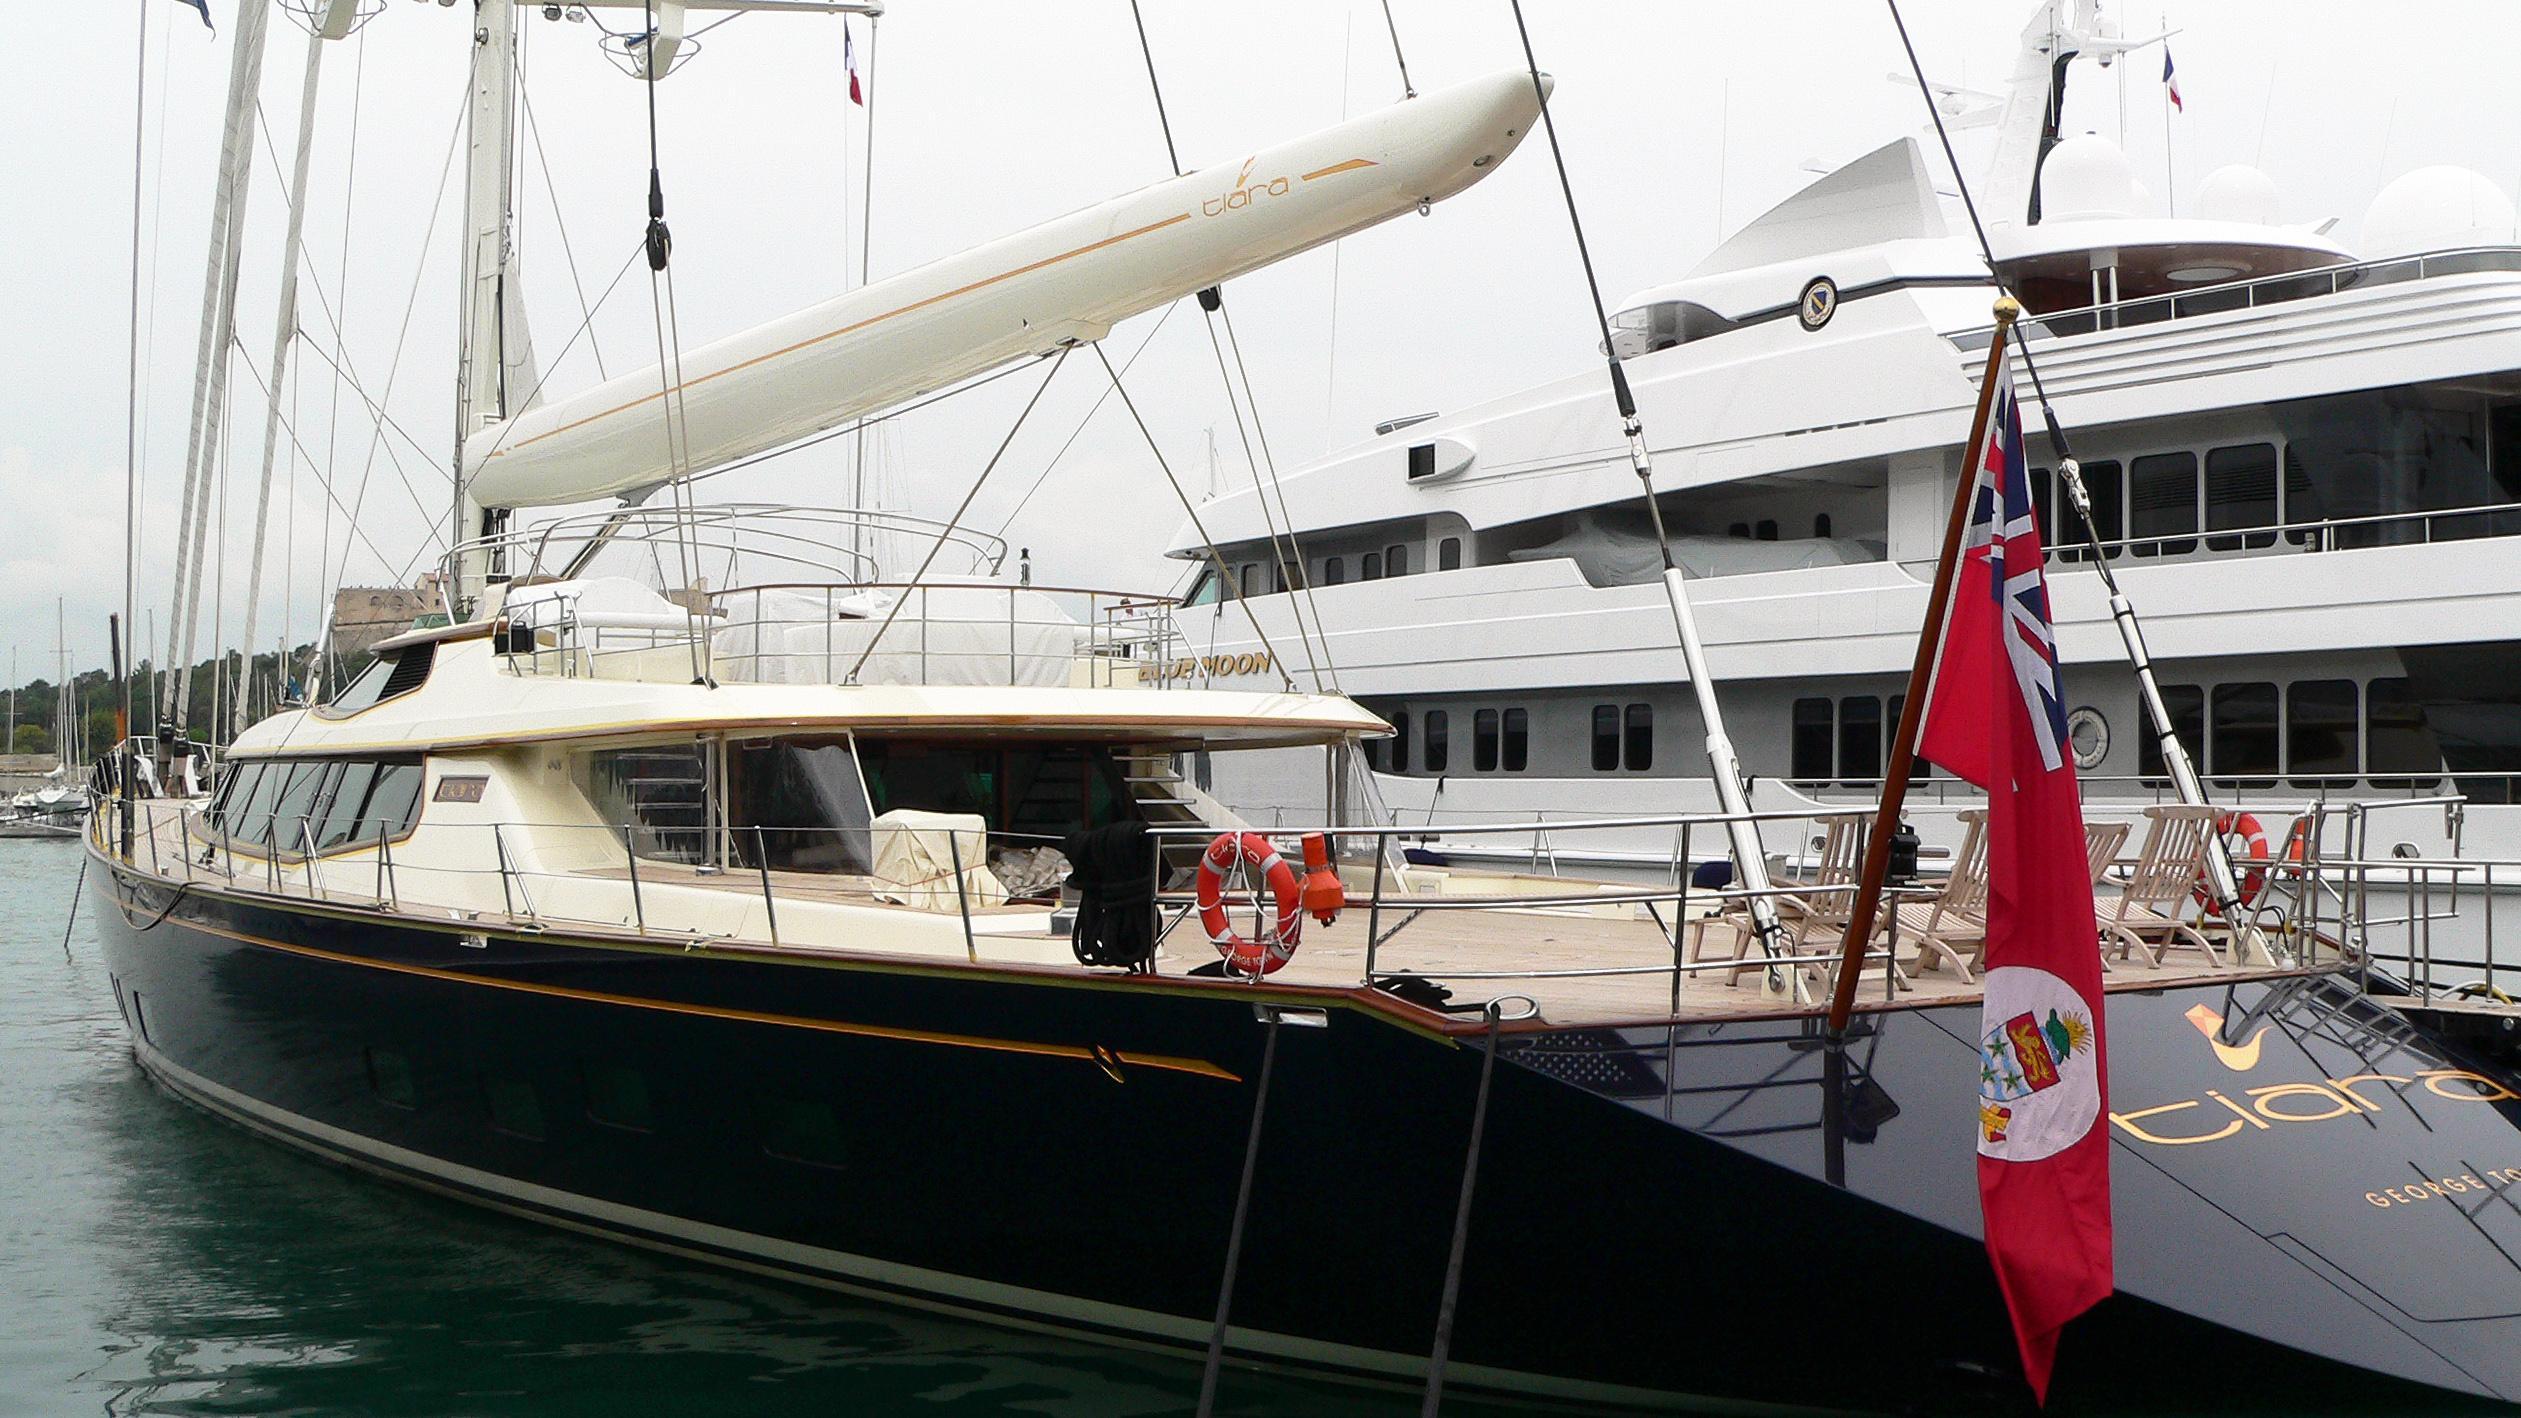 tiara-sailing-yacht-alloy-2004-54m-stern-moored